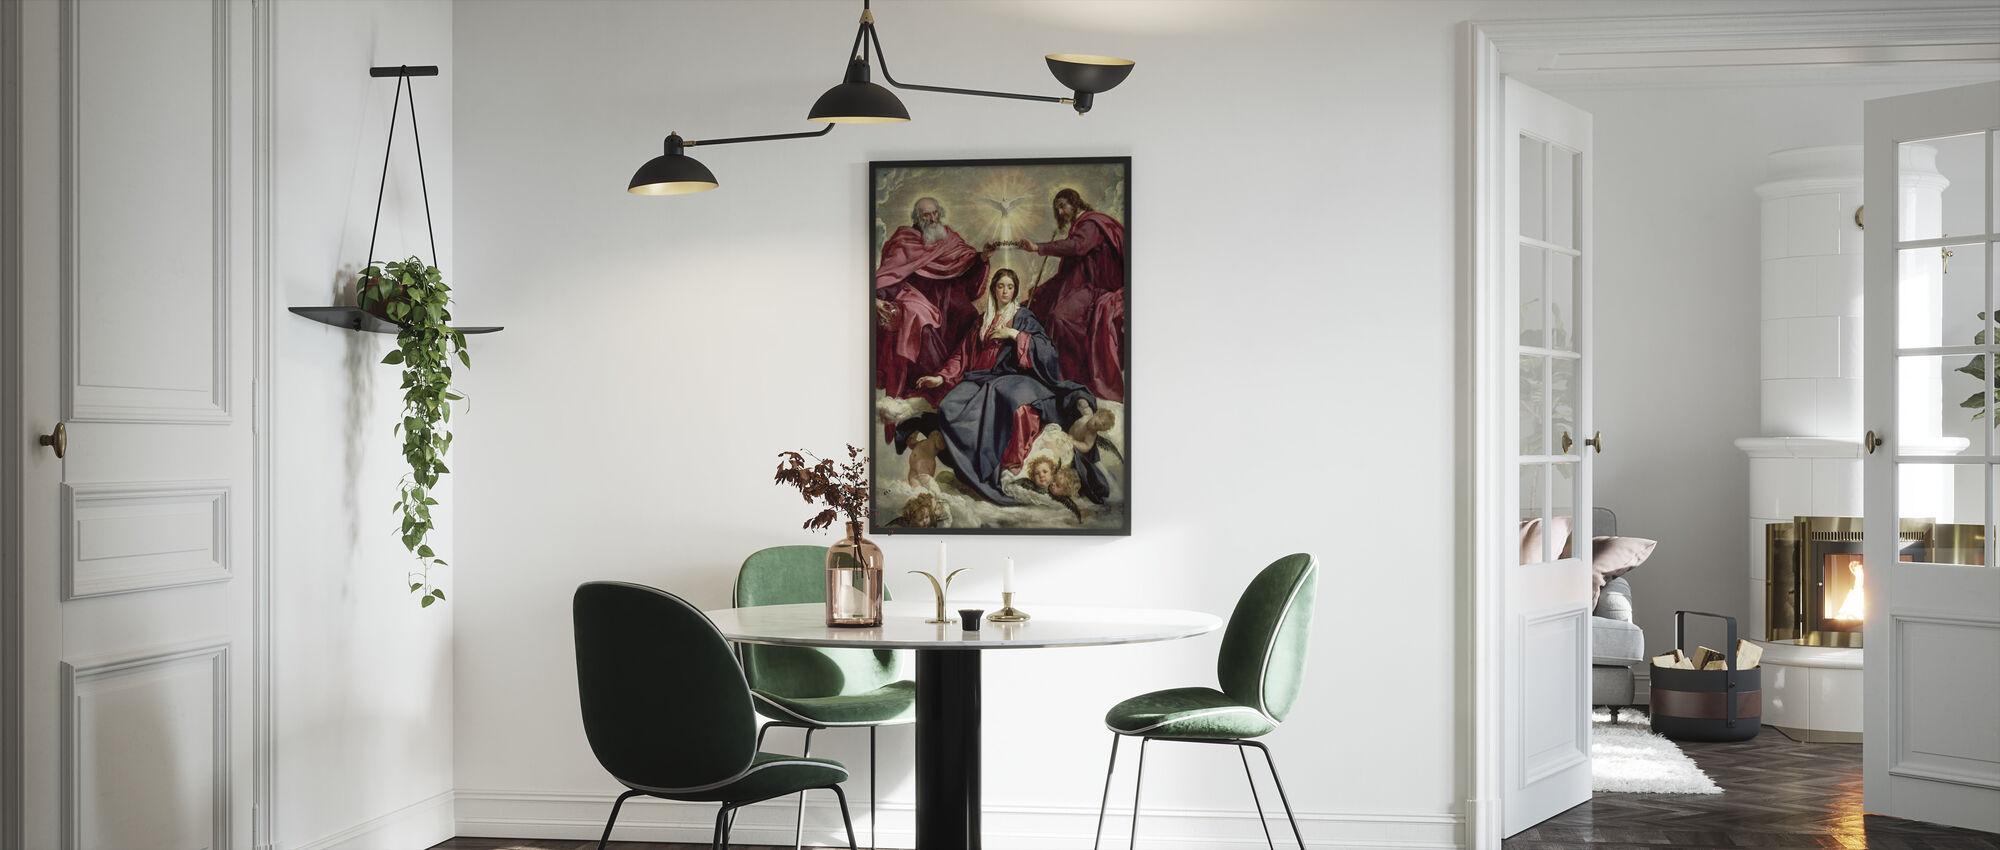 Coronation of the Virgin - Diego Velasquez - Framed print - Kitchen